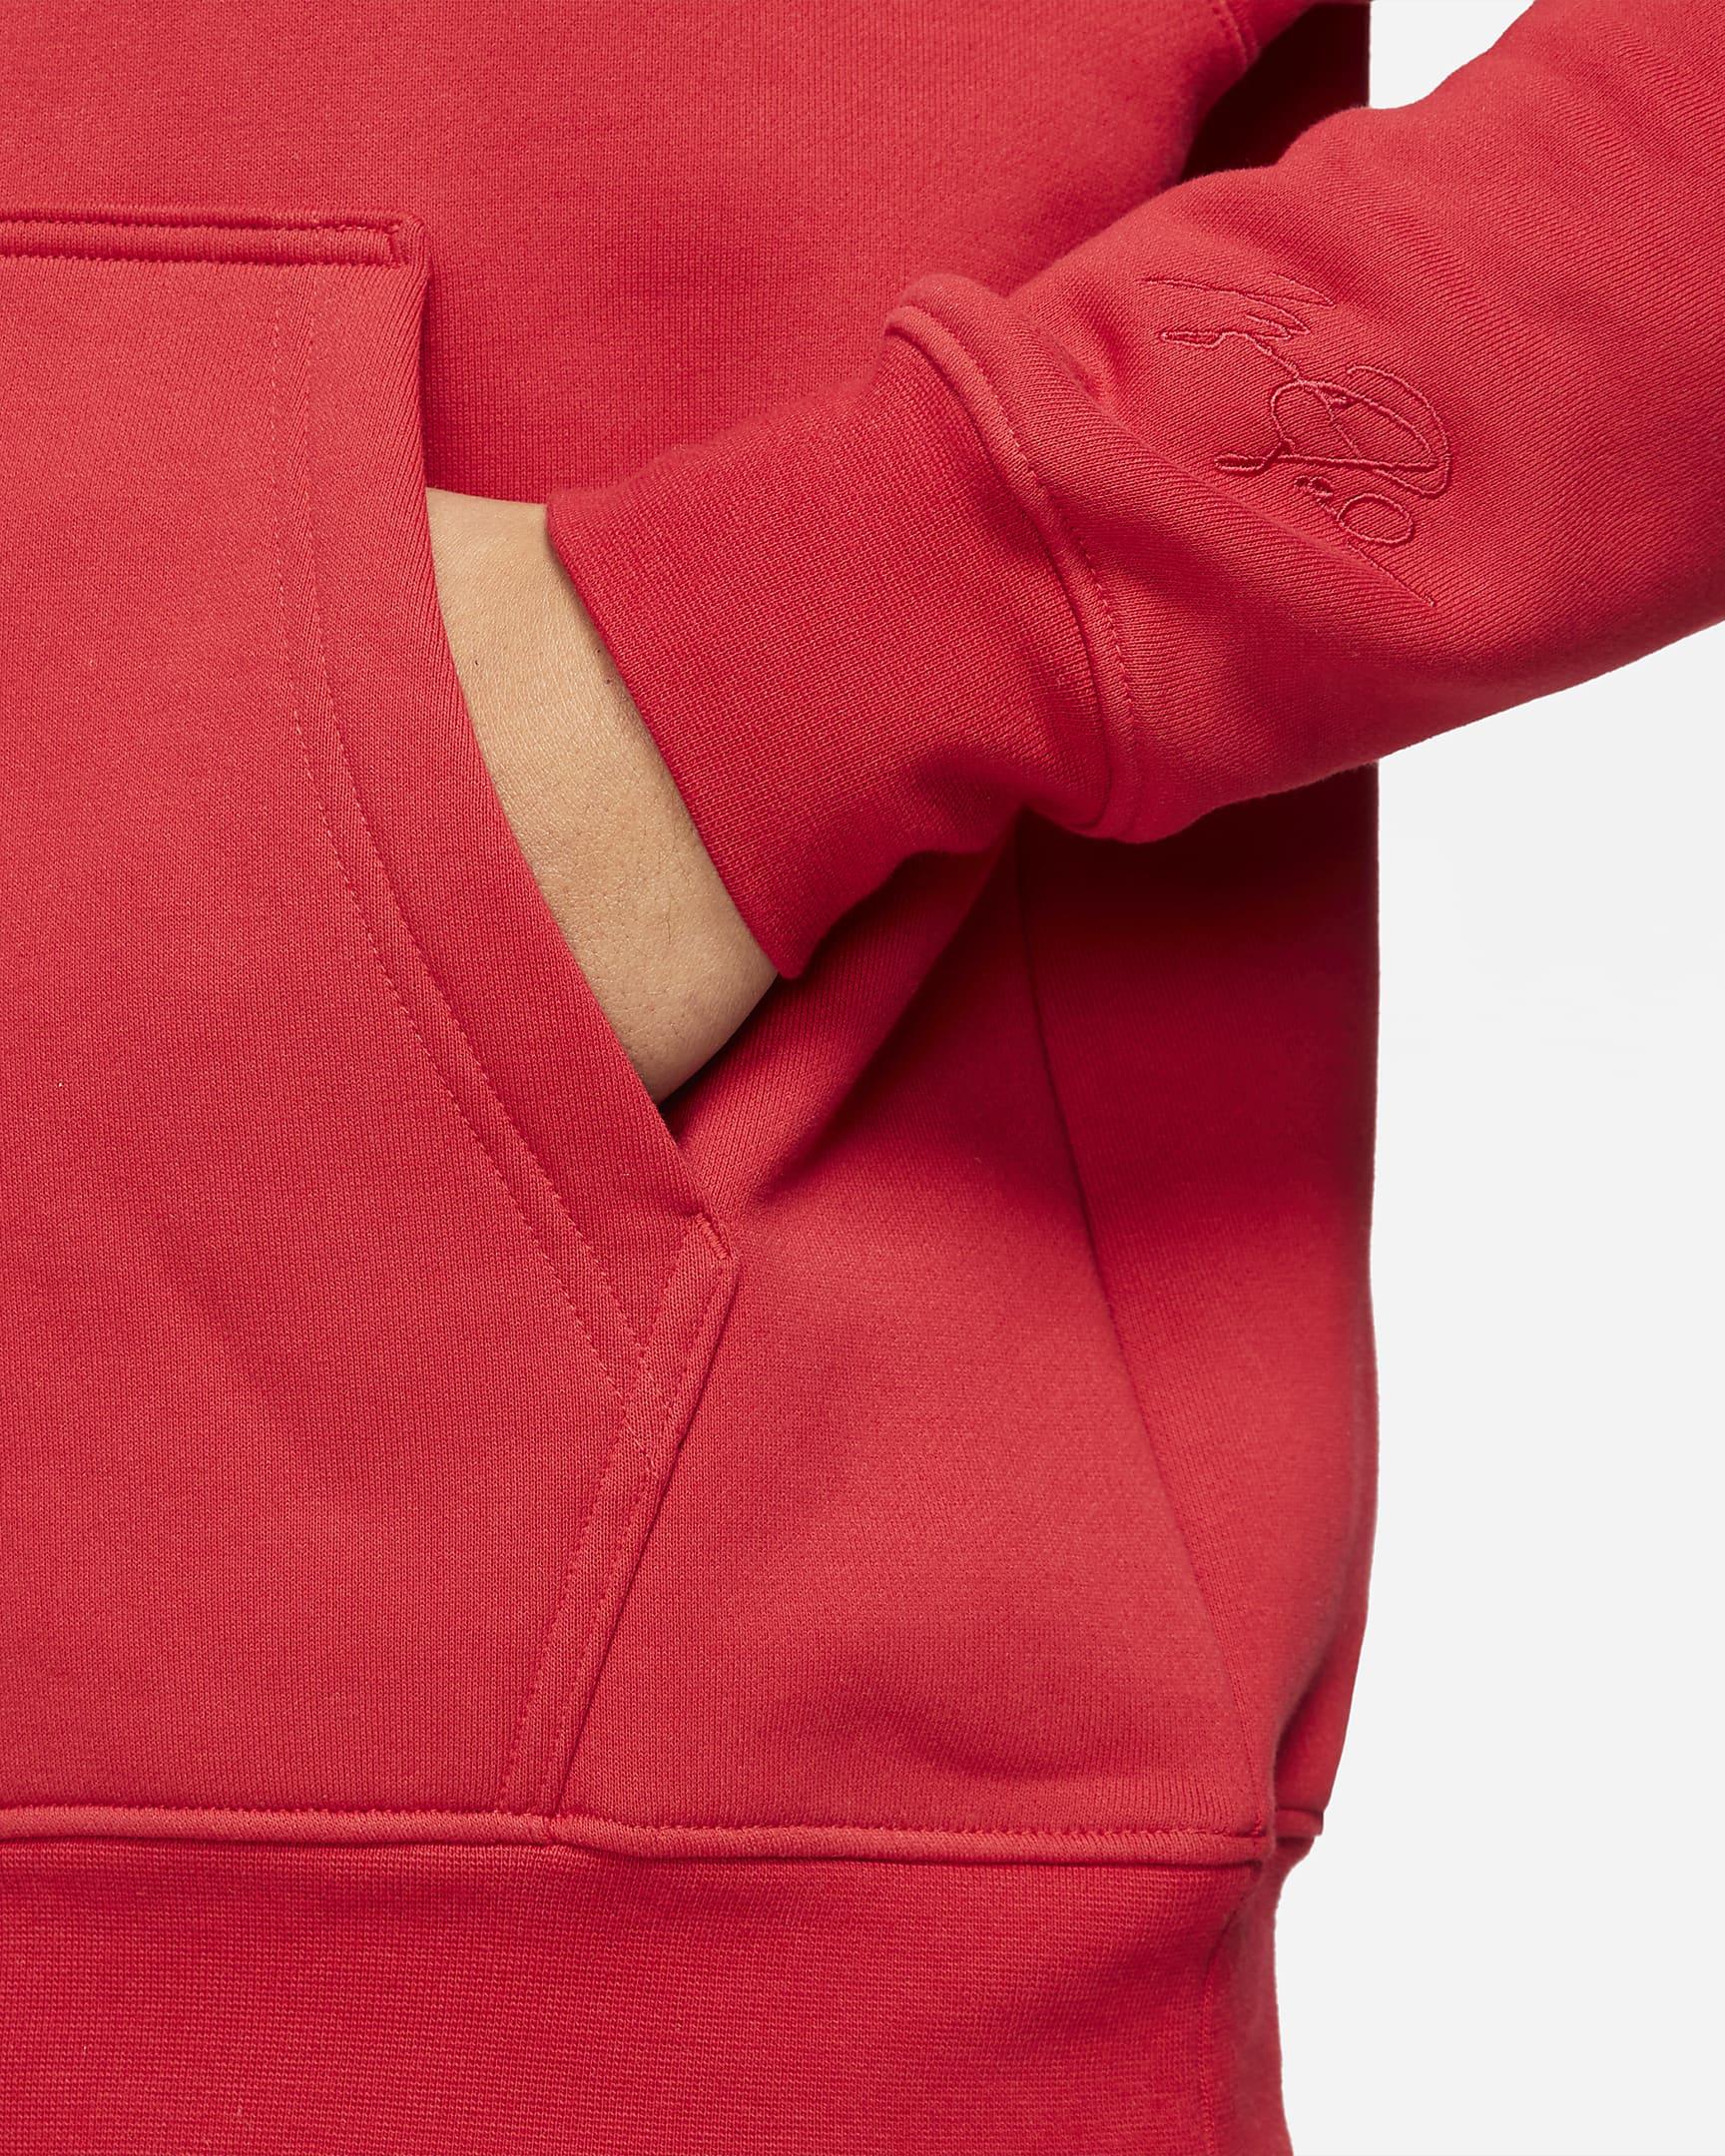 jordan-essentials-mens-fleece-pullover-hoodie-jG54lf-3.png